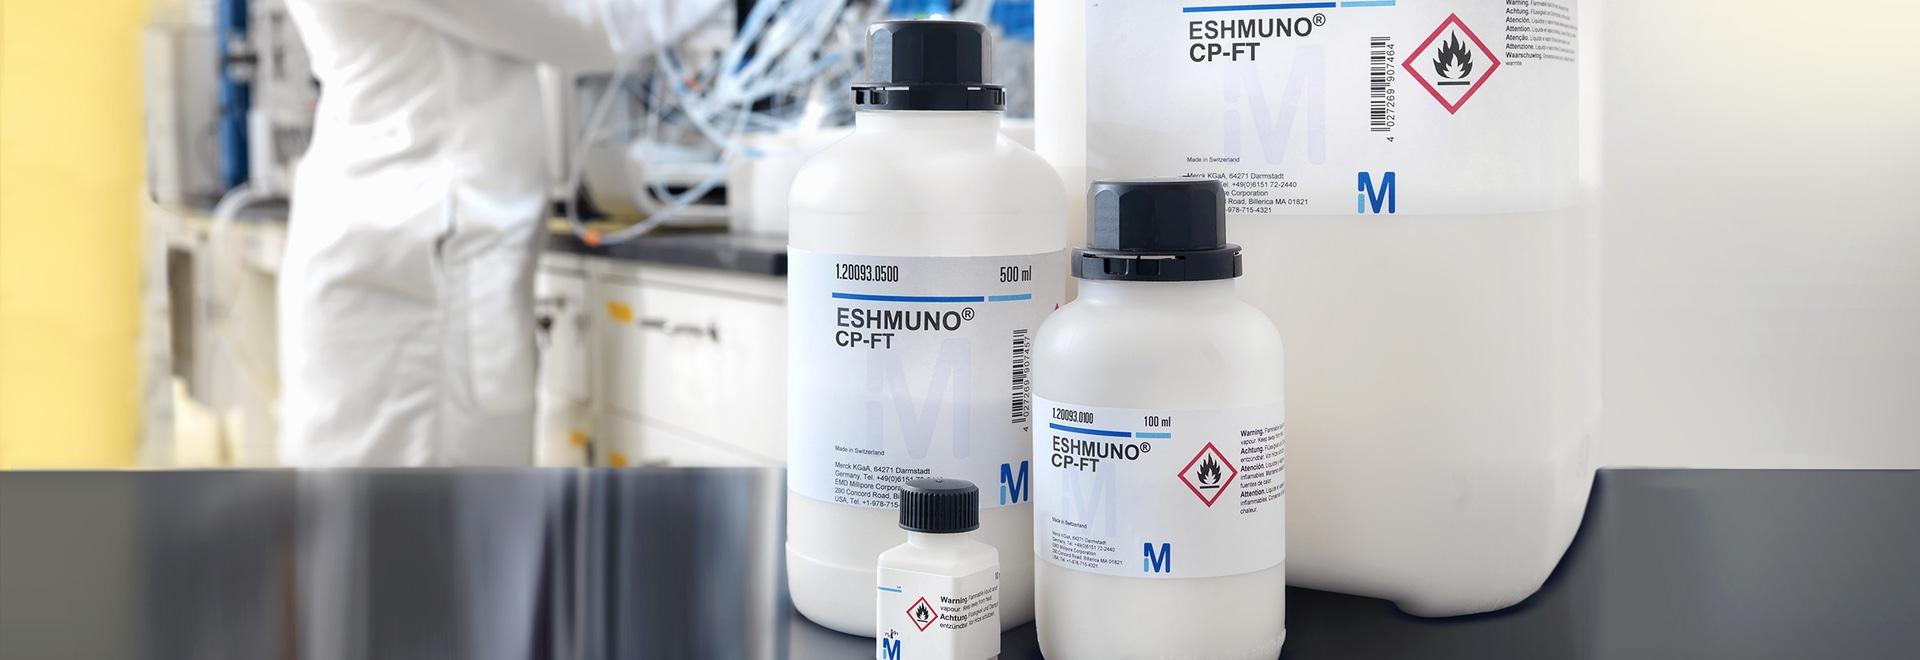 Chromatography Resin Improves Speed, Flexibility